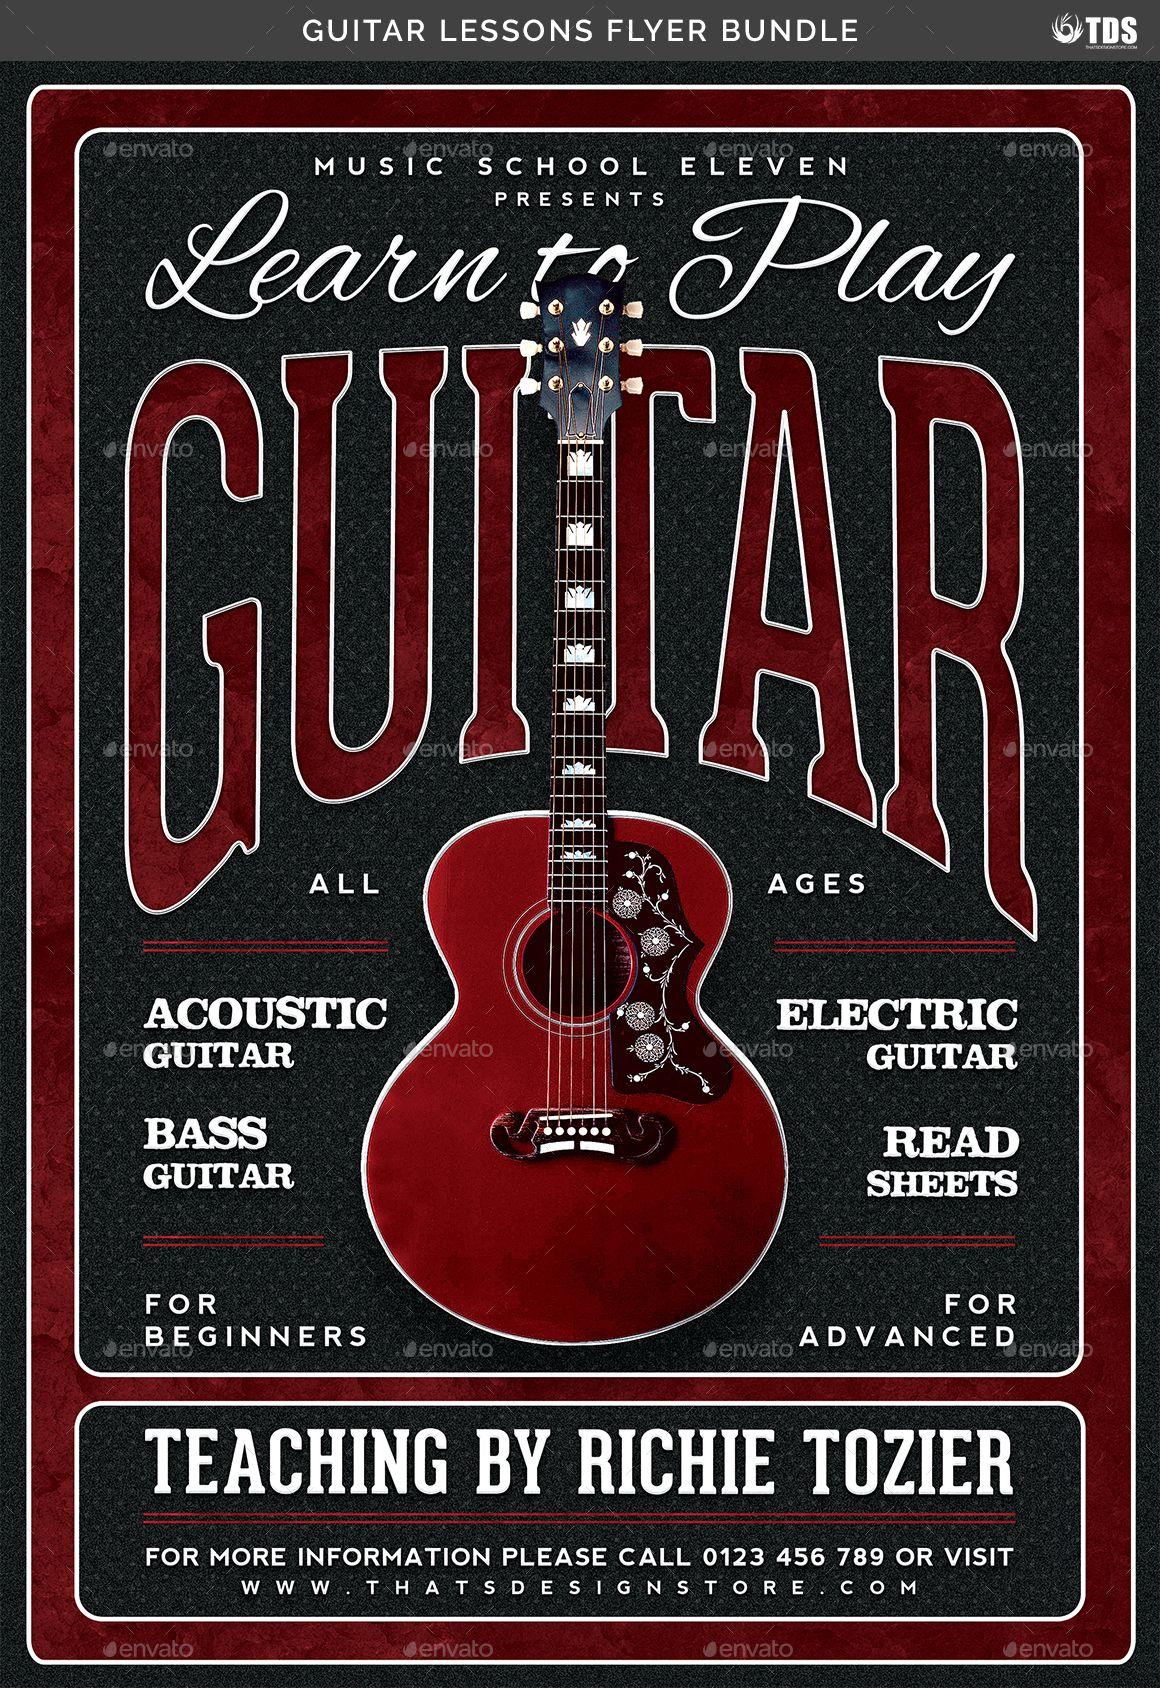 Guitar Lessons Flyer Bundle Guitar lessons, Flyer